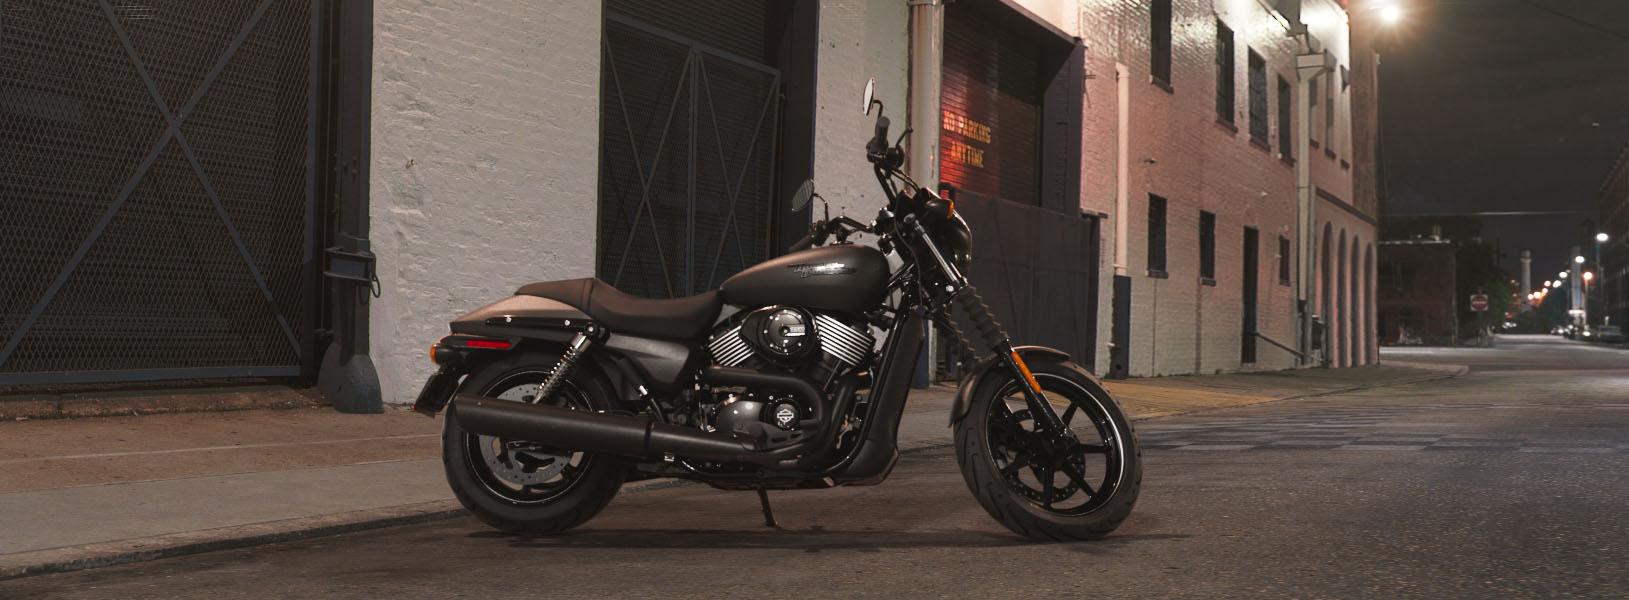 ebc6645b8 Ceník motocyklů 2019 - Harley-Davidson® Praha